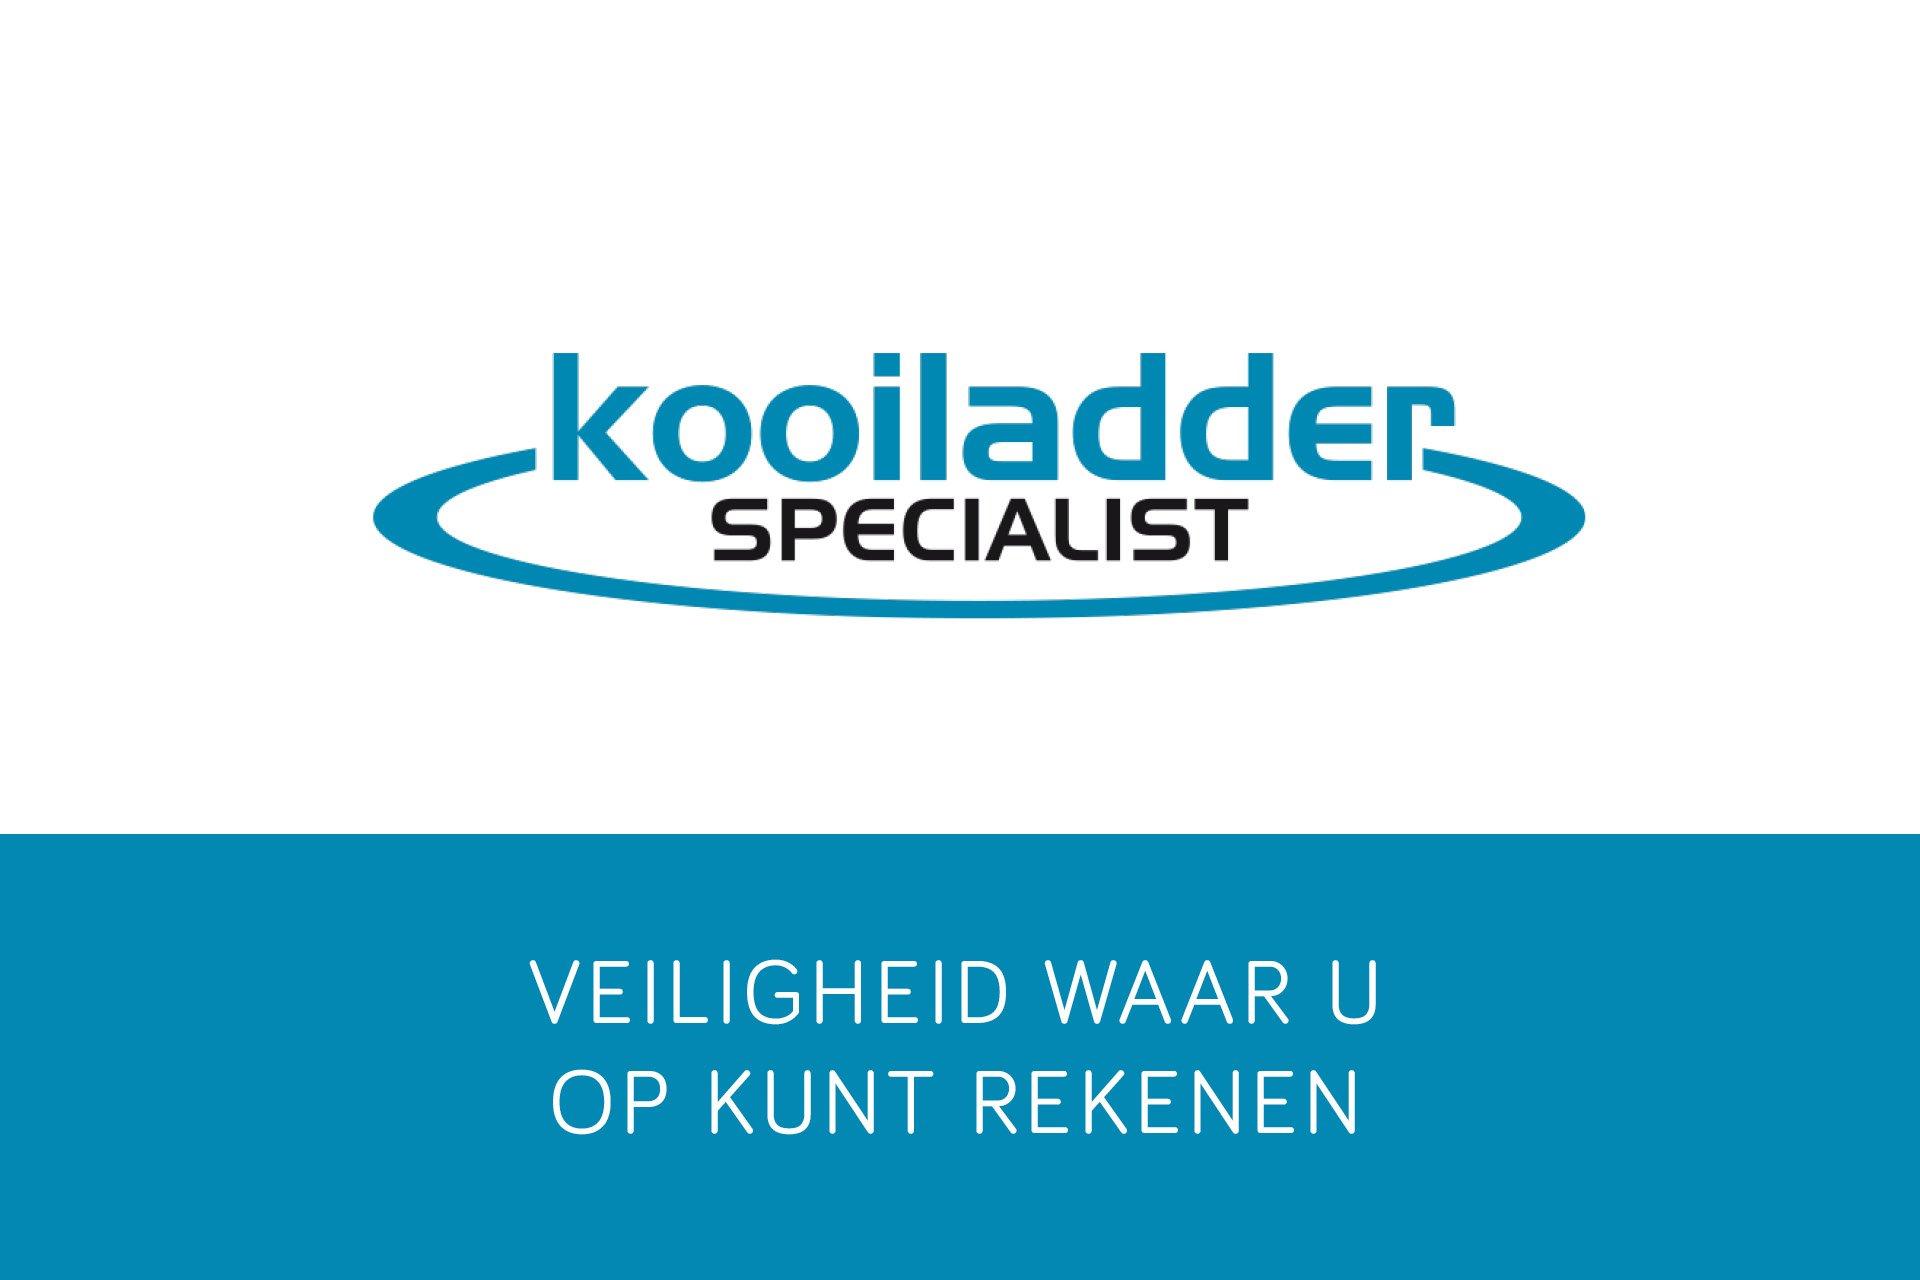 Kooiladderspecialist.nl